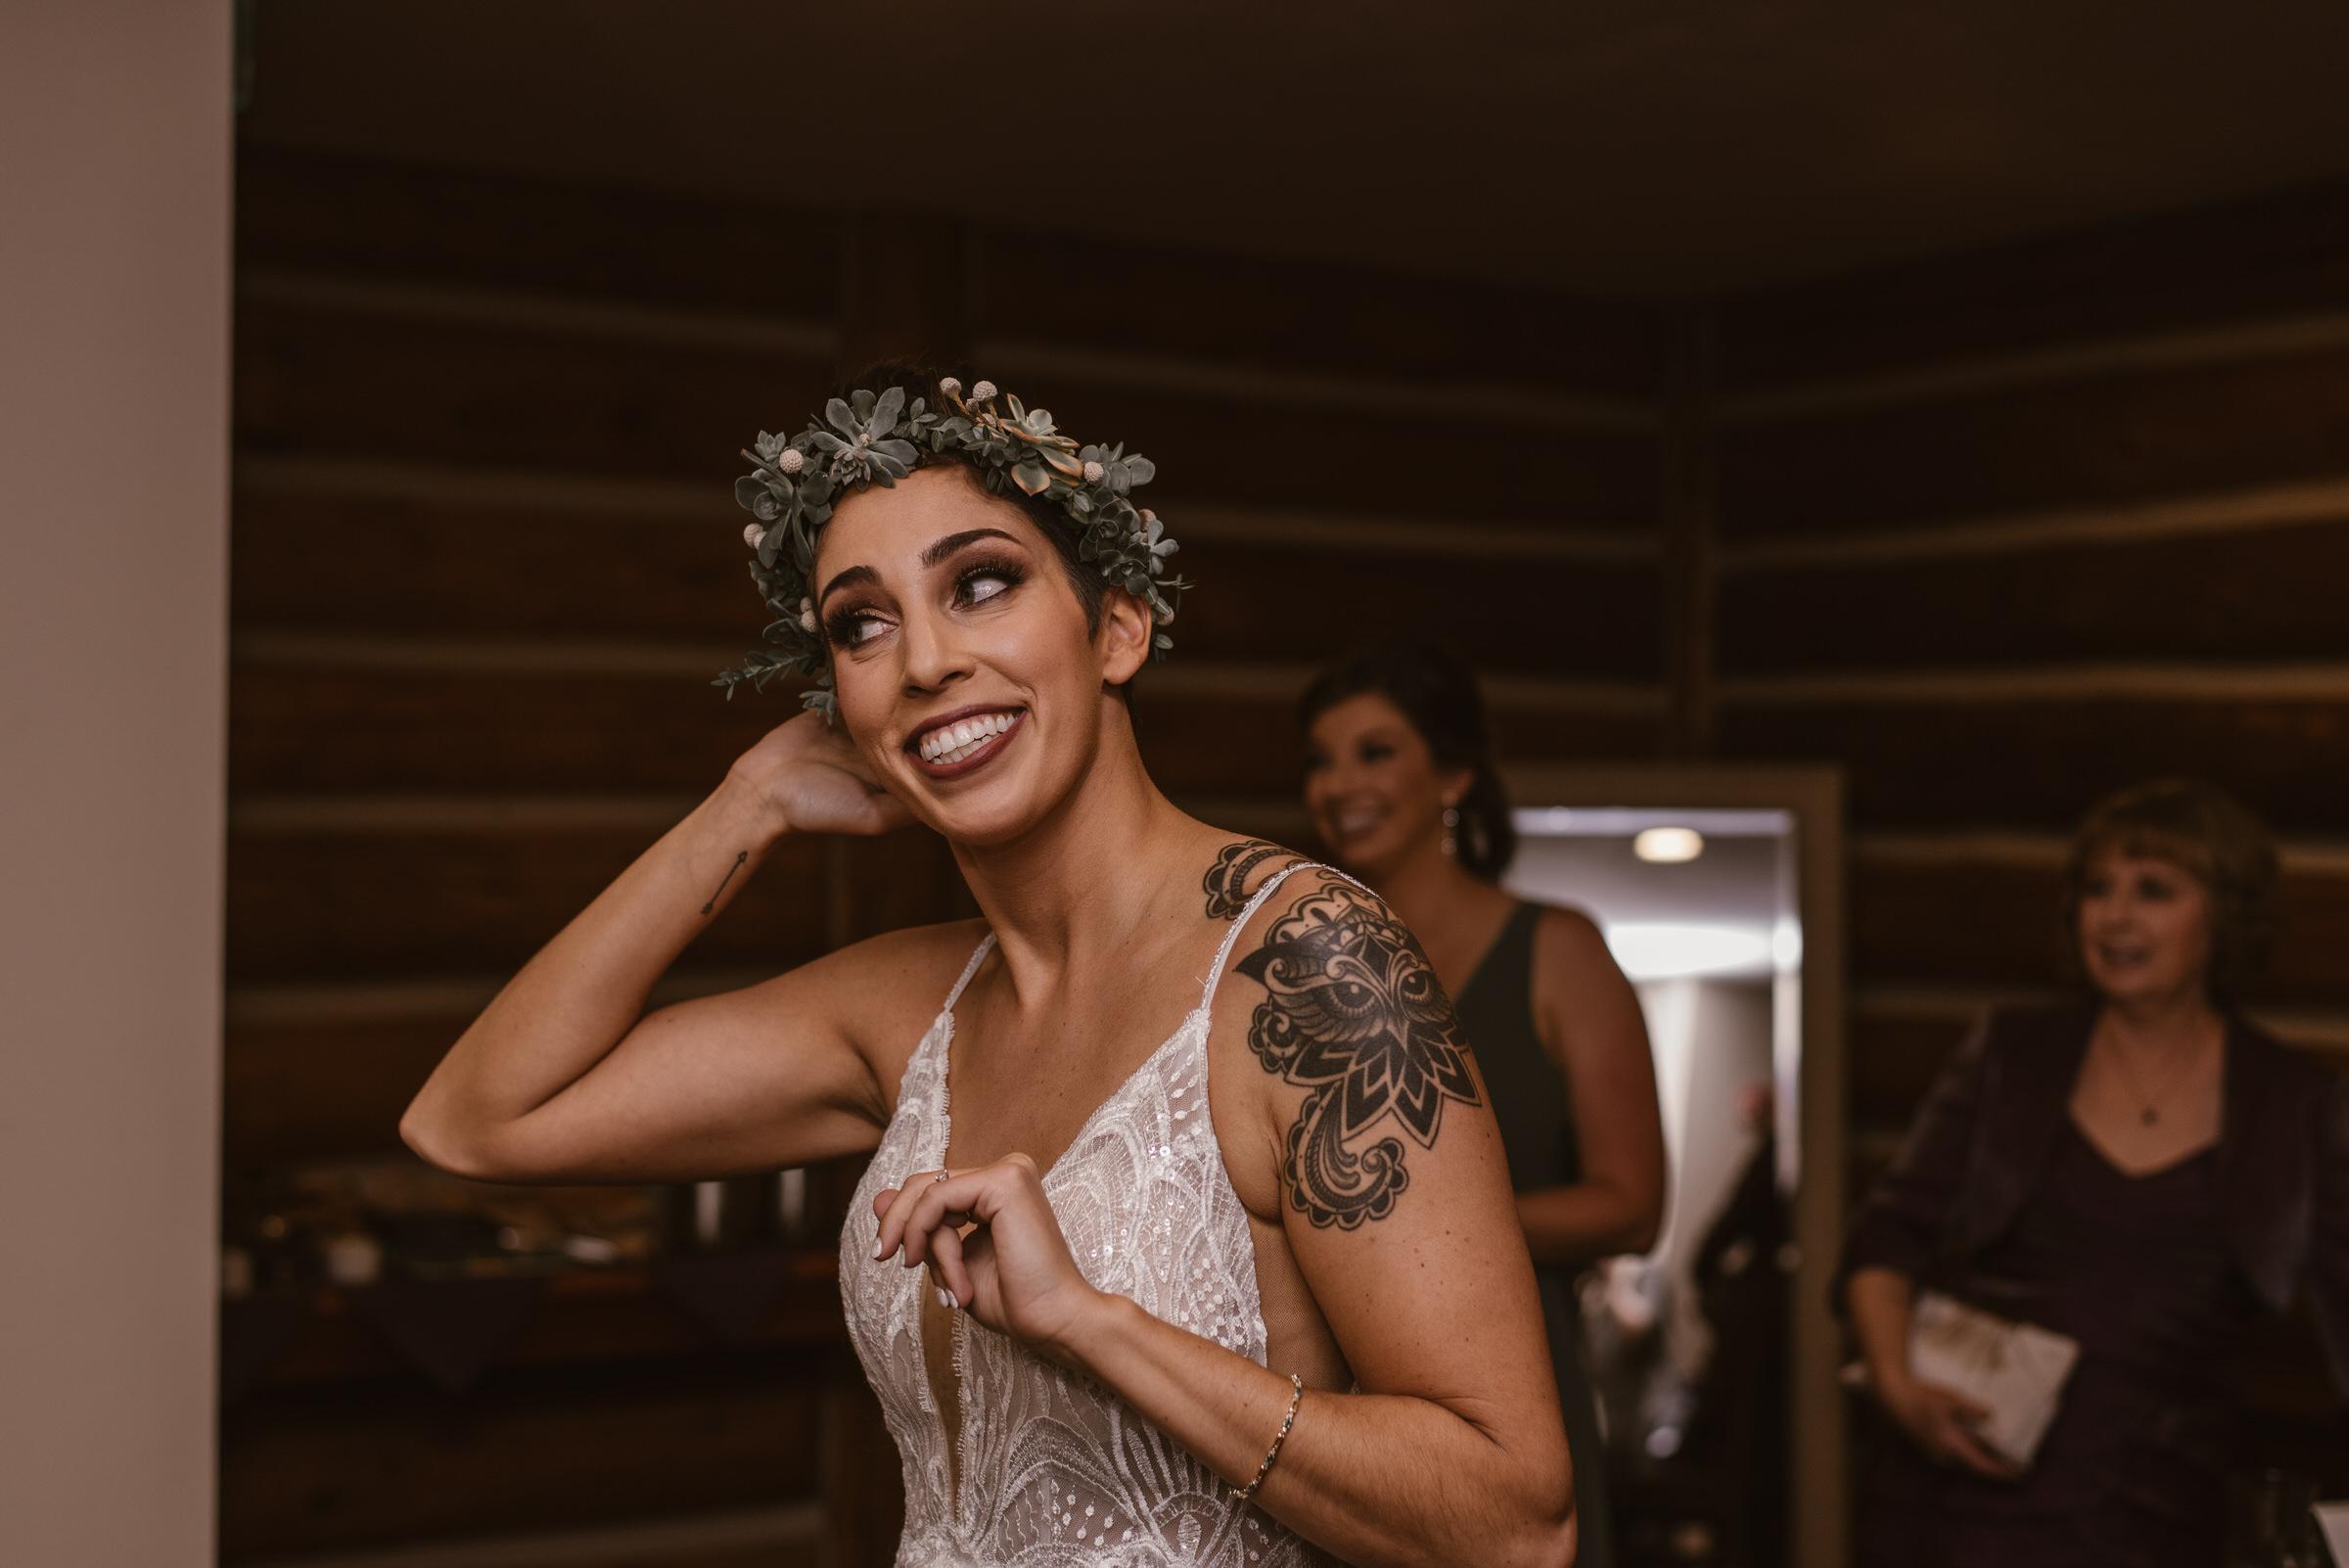 Wilderness-Ridge-Lincoln-Nebraska-Wedding-Kaylie-Sirek-Photography-024.jpg